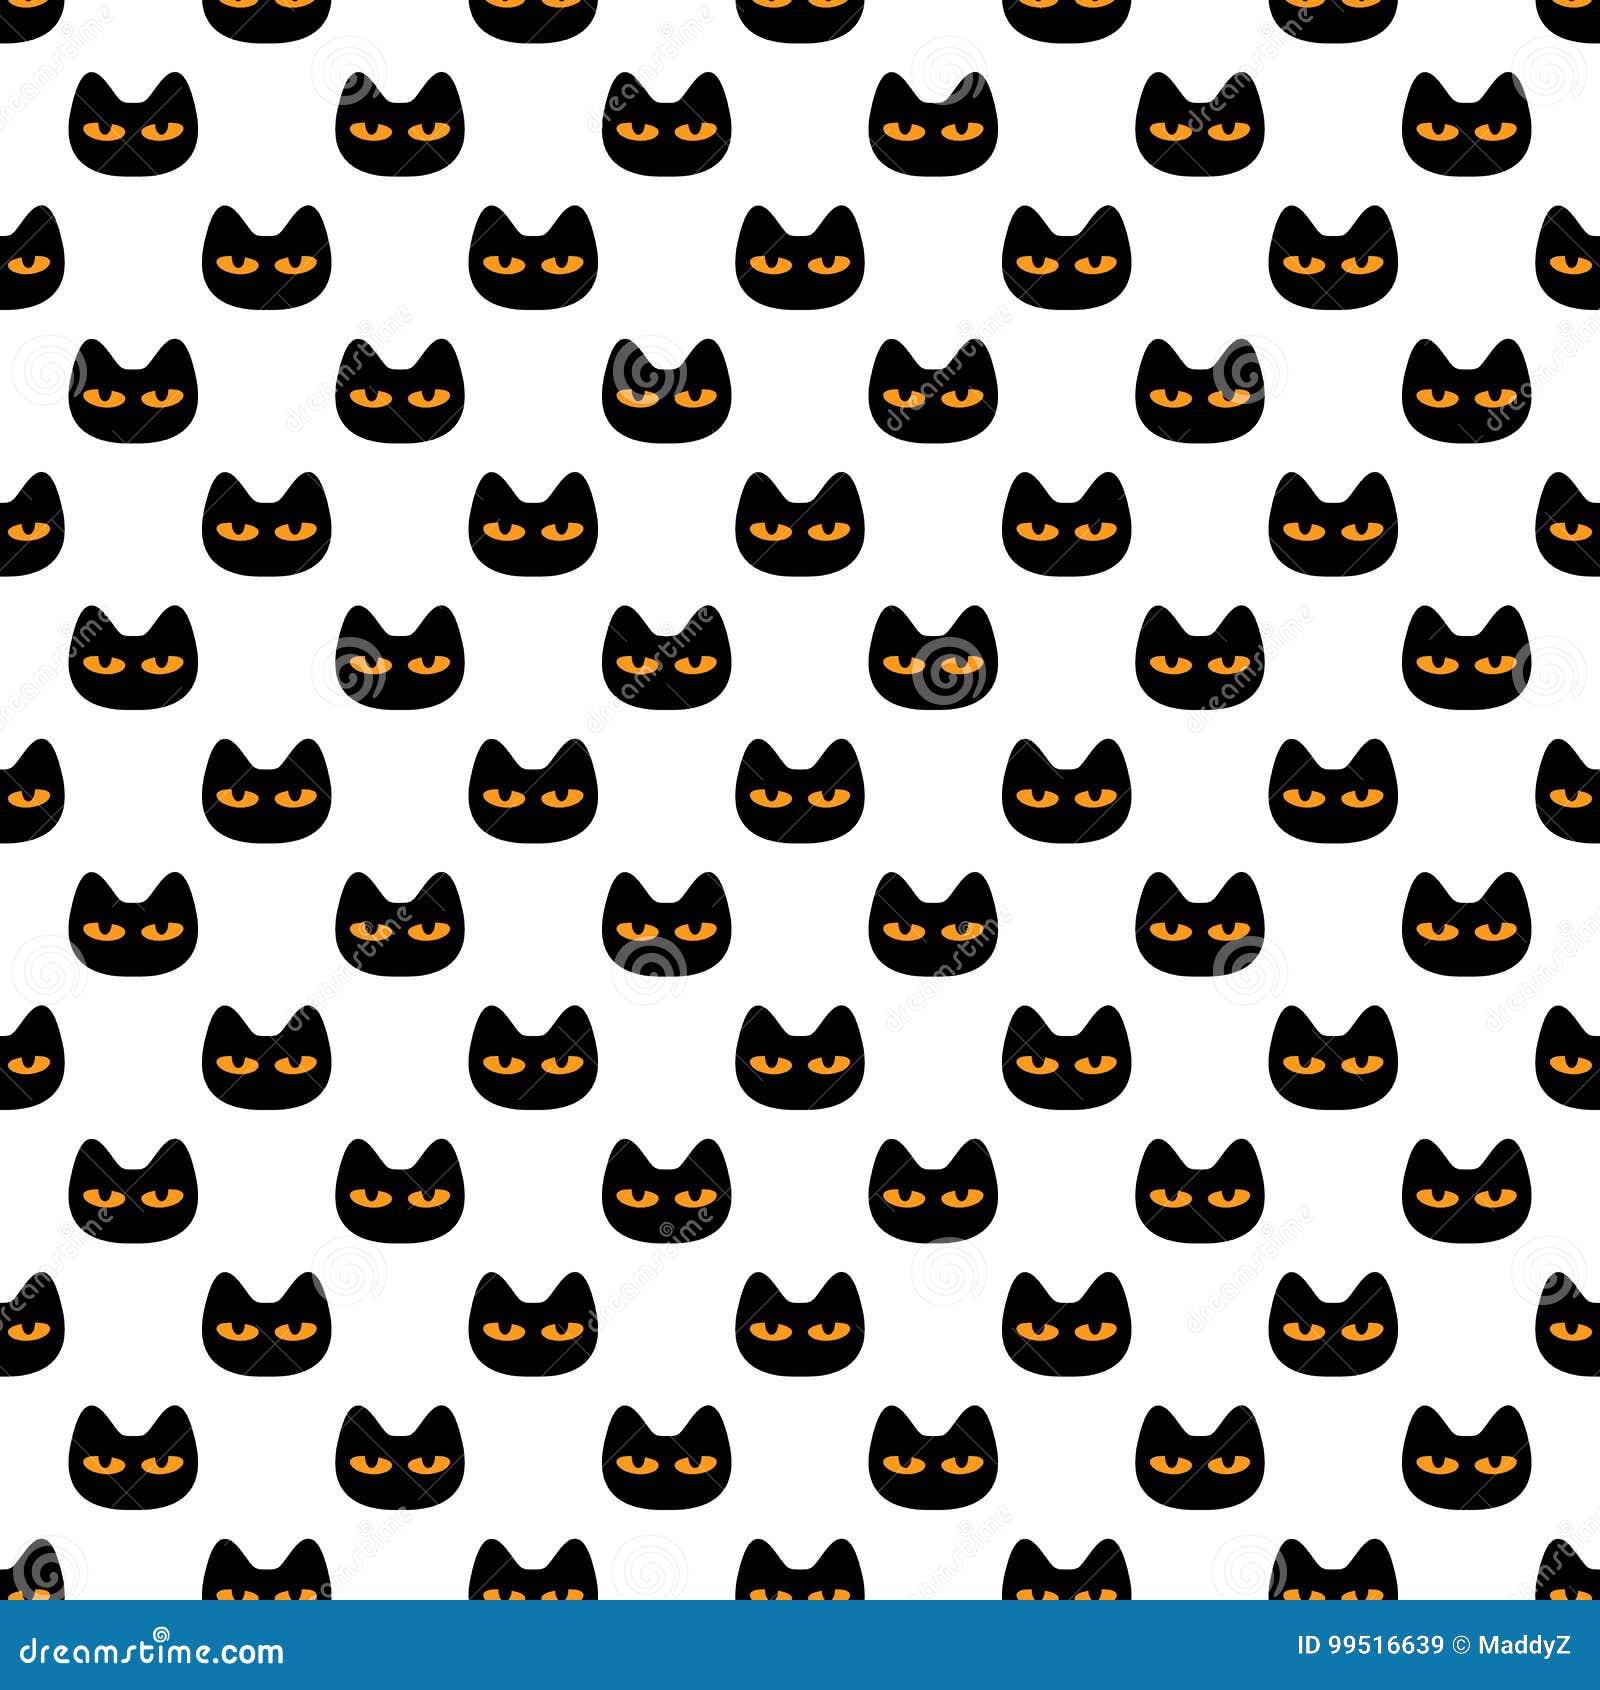 eye cat fabric design ekenasfiber johnhenriksson se u2022 rh ekenasfiber johnhenriksson se